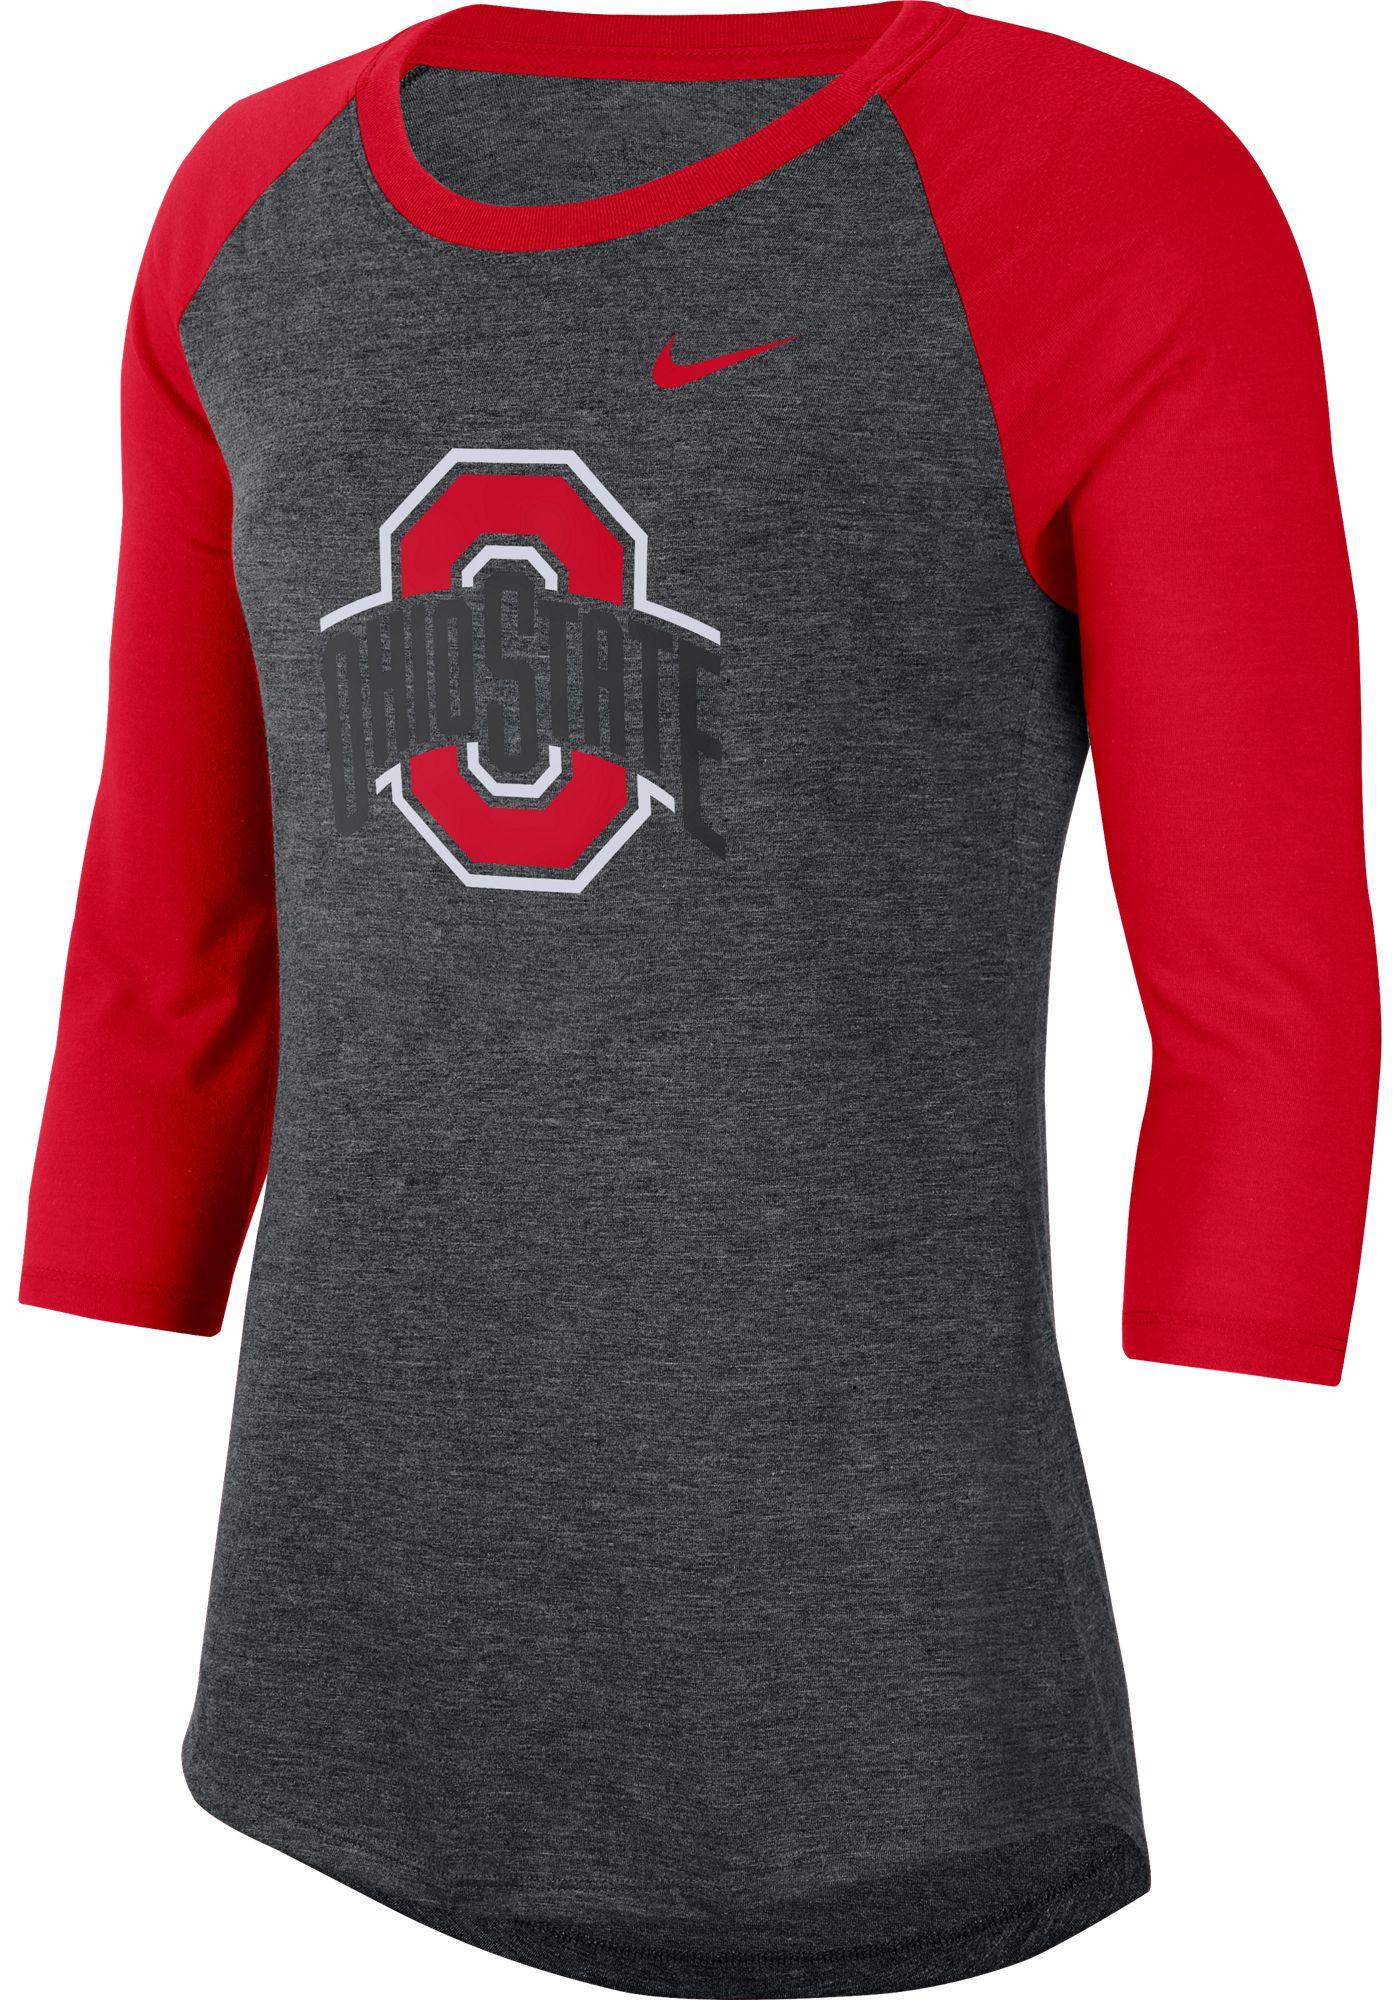 Nike Women's Ohio State Buckeyes Grey Dri-FIT Raglan ¾ Sleeve T-Shirt